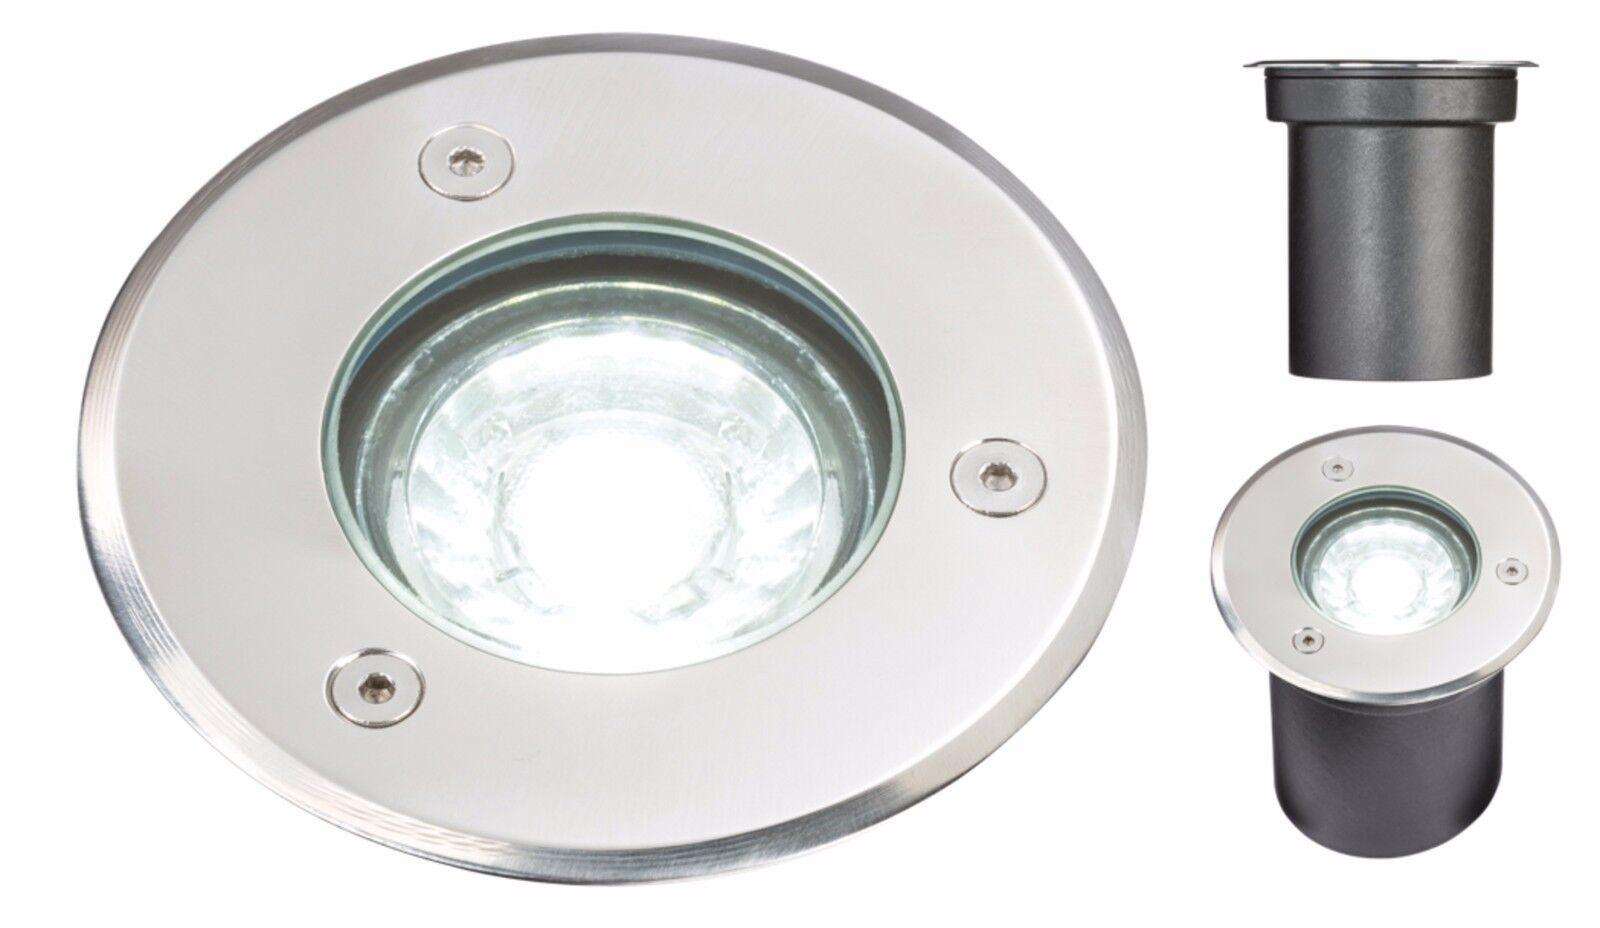 Knightsbridge 230V 3W IP65 Led Pavimento   Luce Terrazza Lampada 3000K Bianco